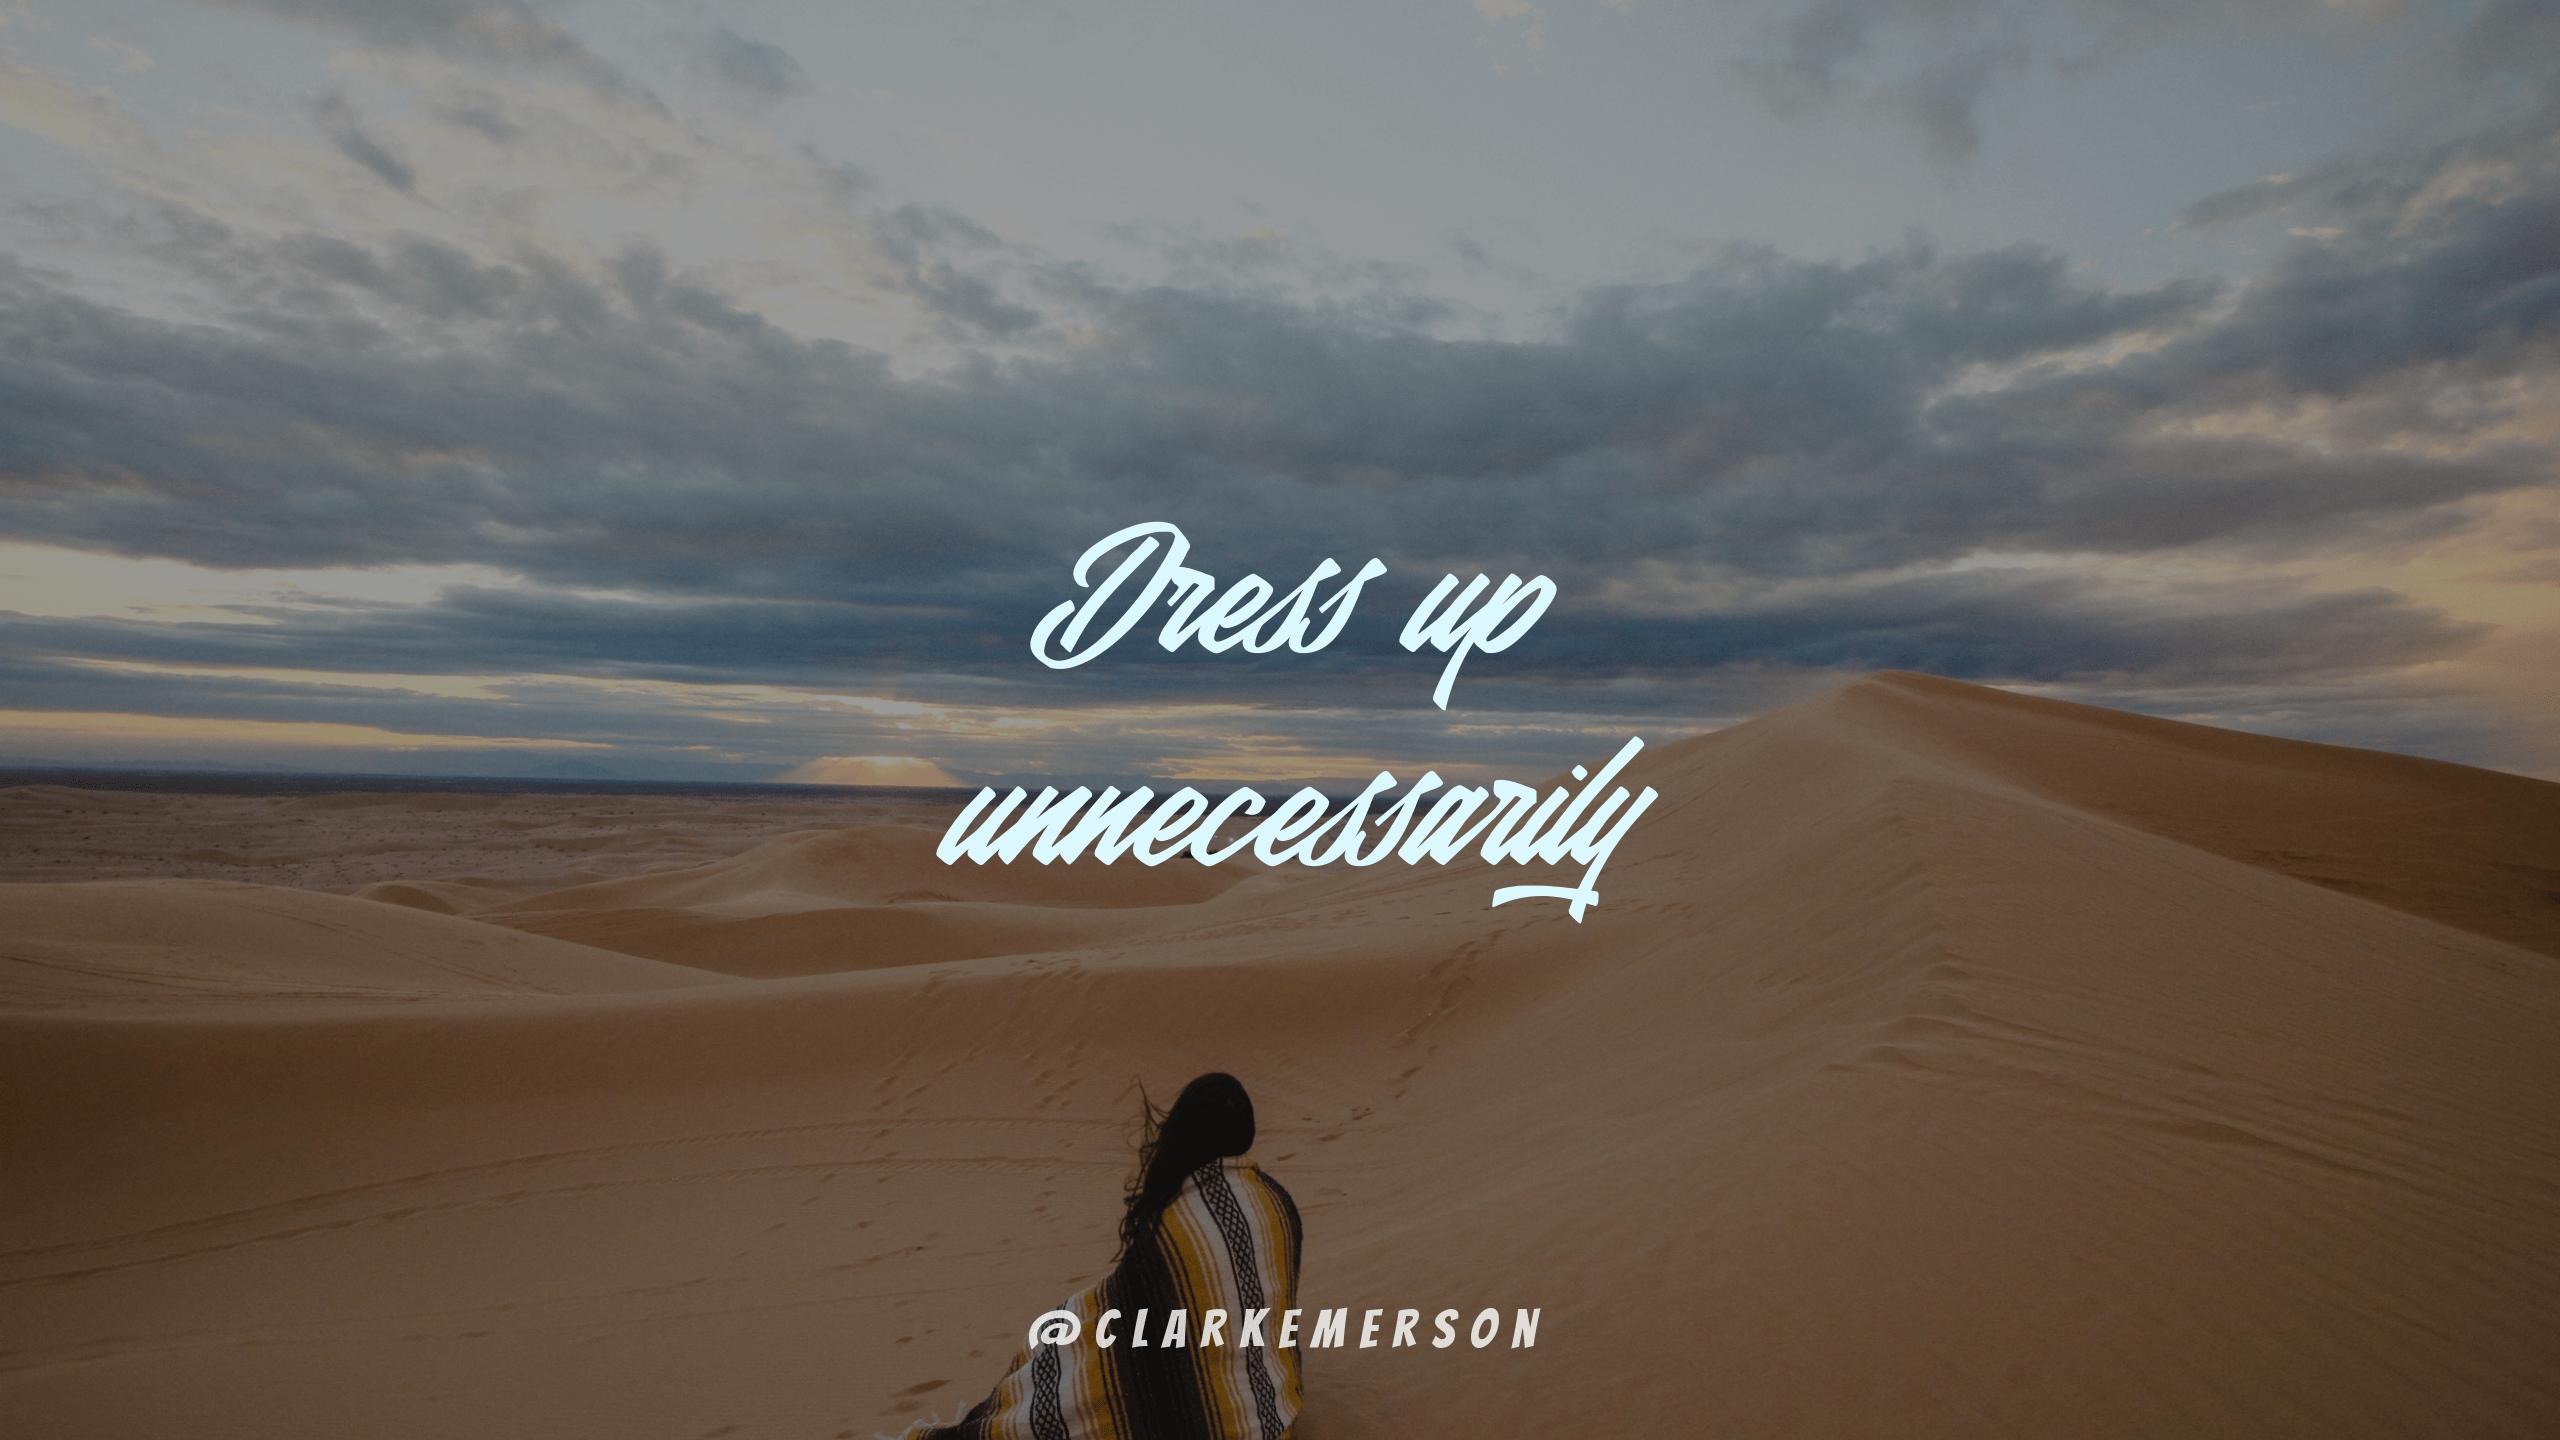 Sky,                Sand,                Desert,                Landscape,                Aeolian,                Landform,                Sahara,                Dune,                Horizon,                Erg,                Singing,                Aztec,                Woman,                 Free Image